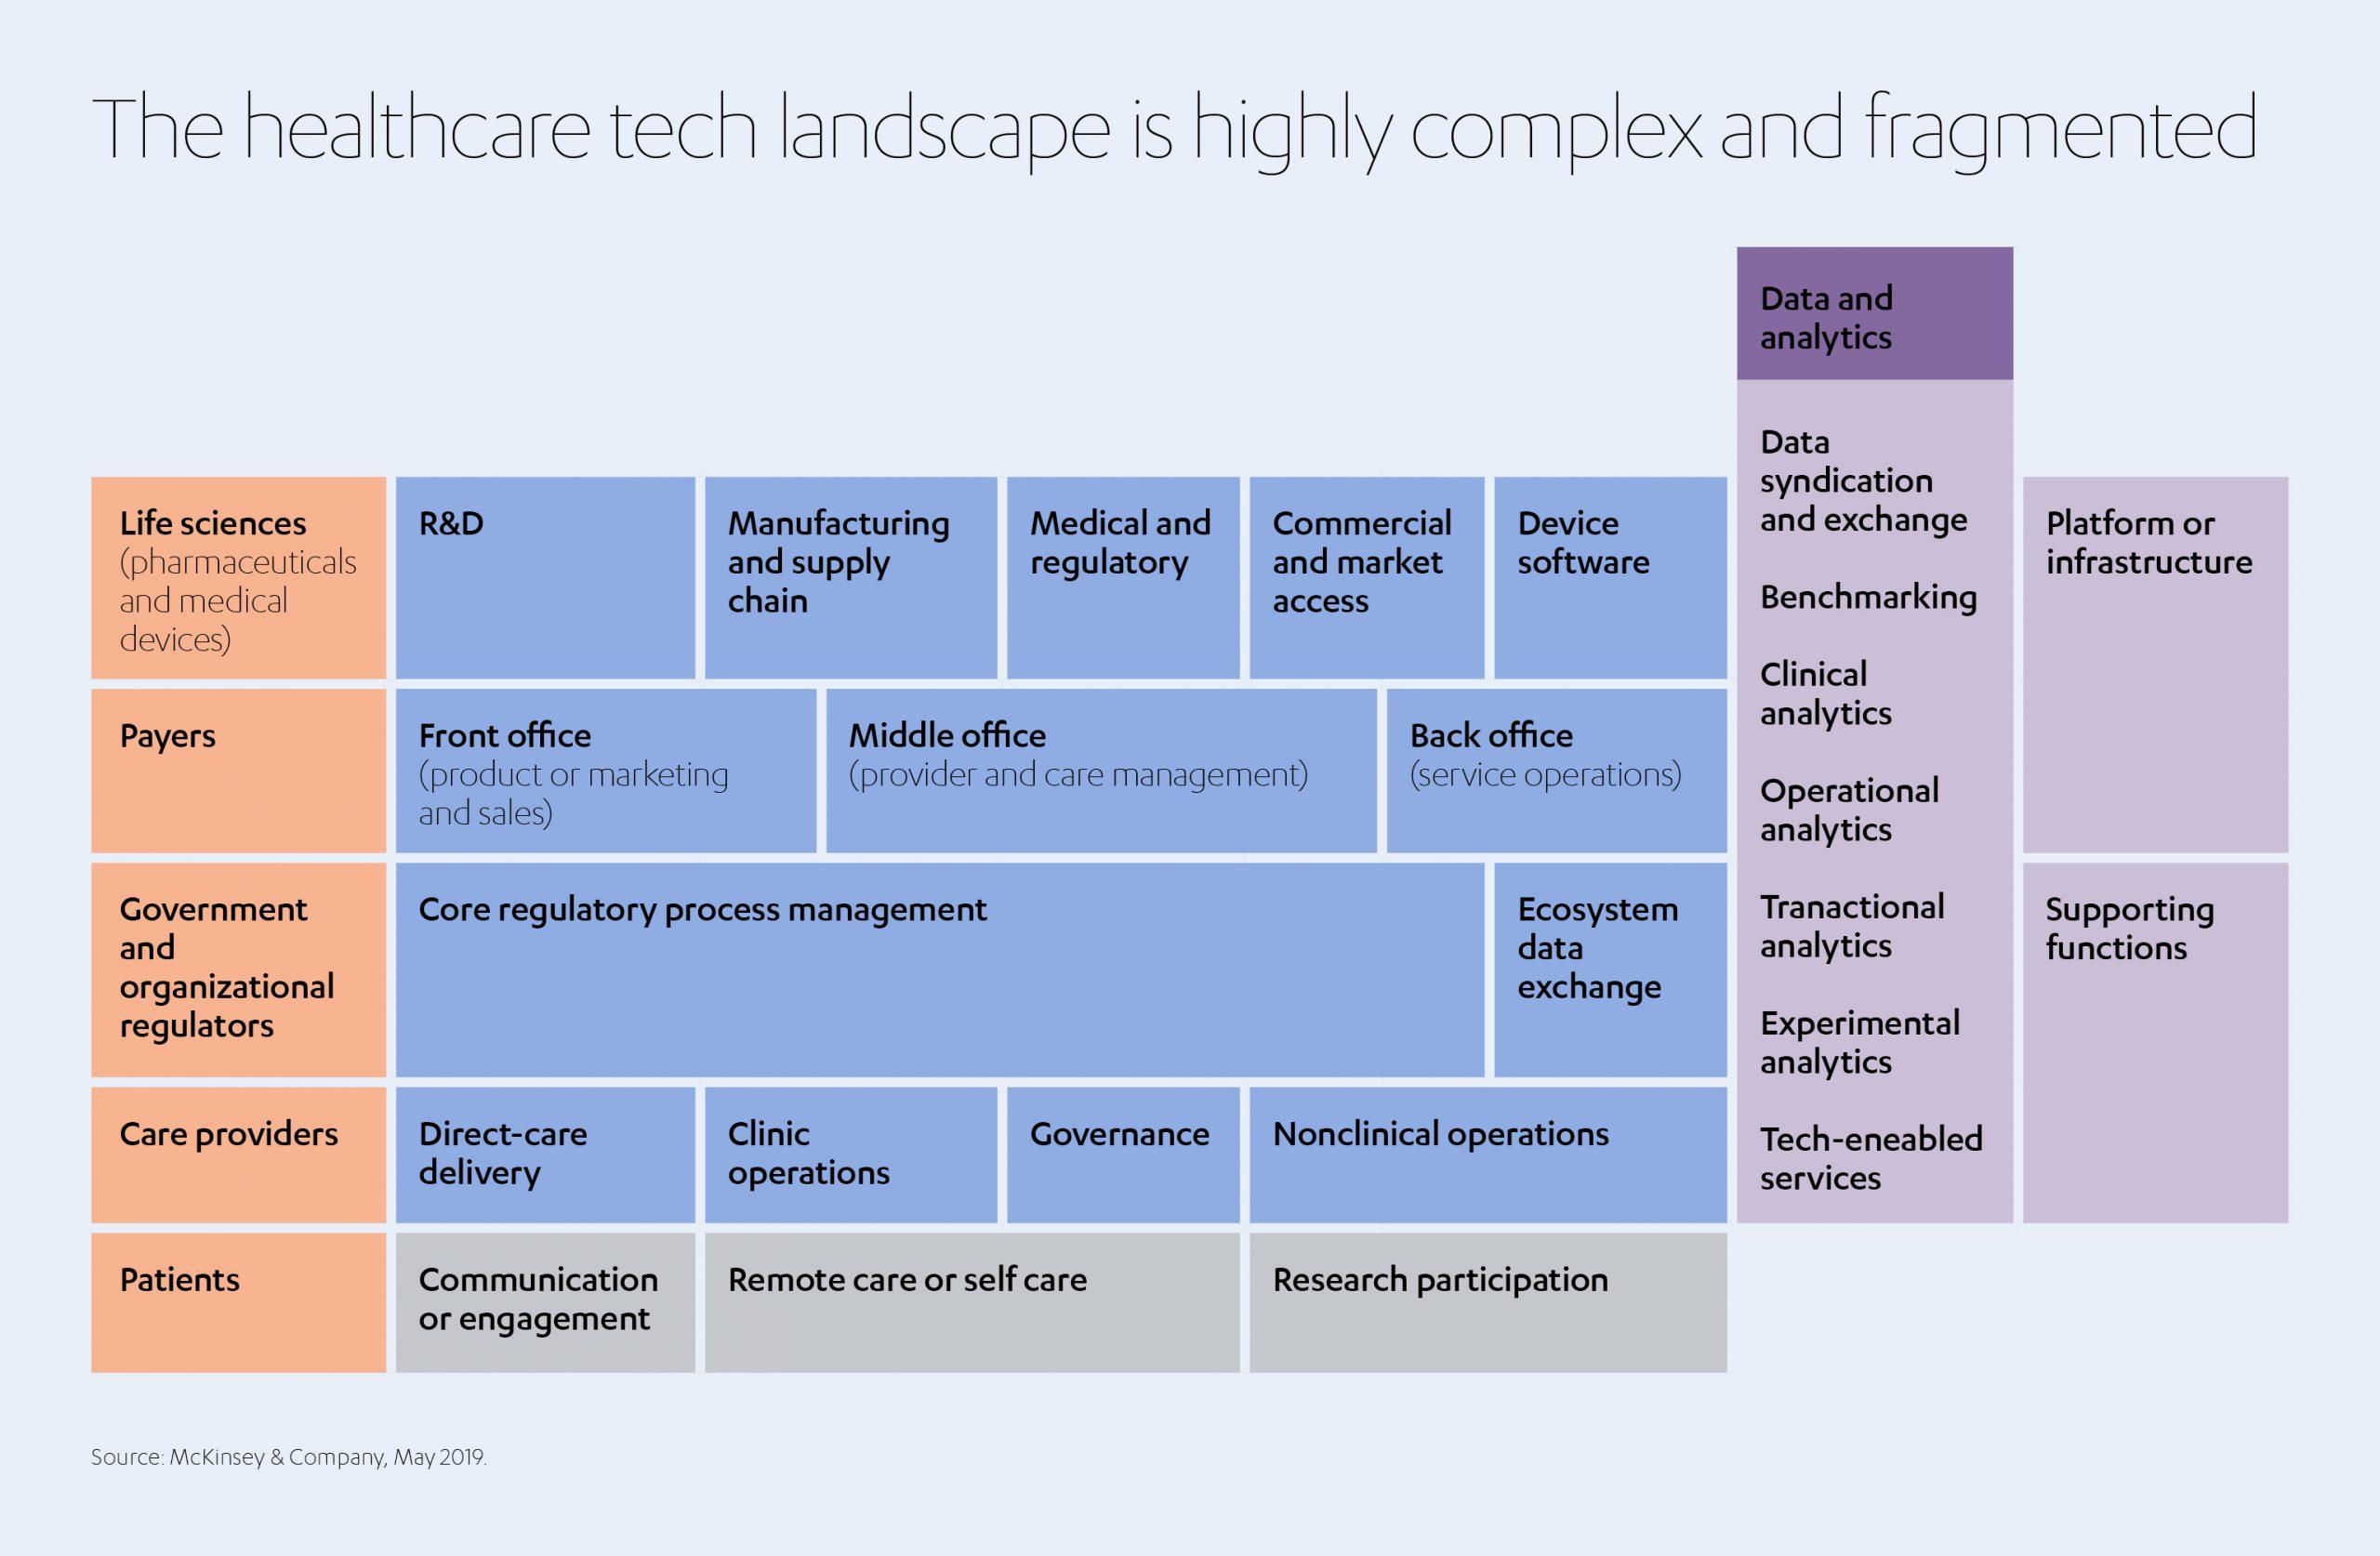 ALJ Health Tech Landscapes